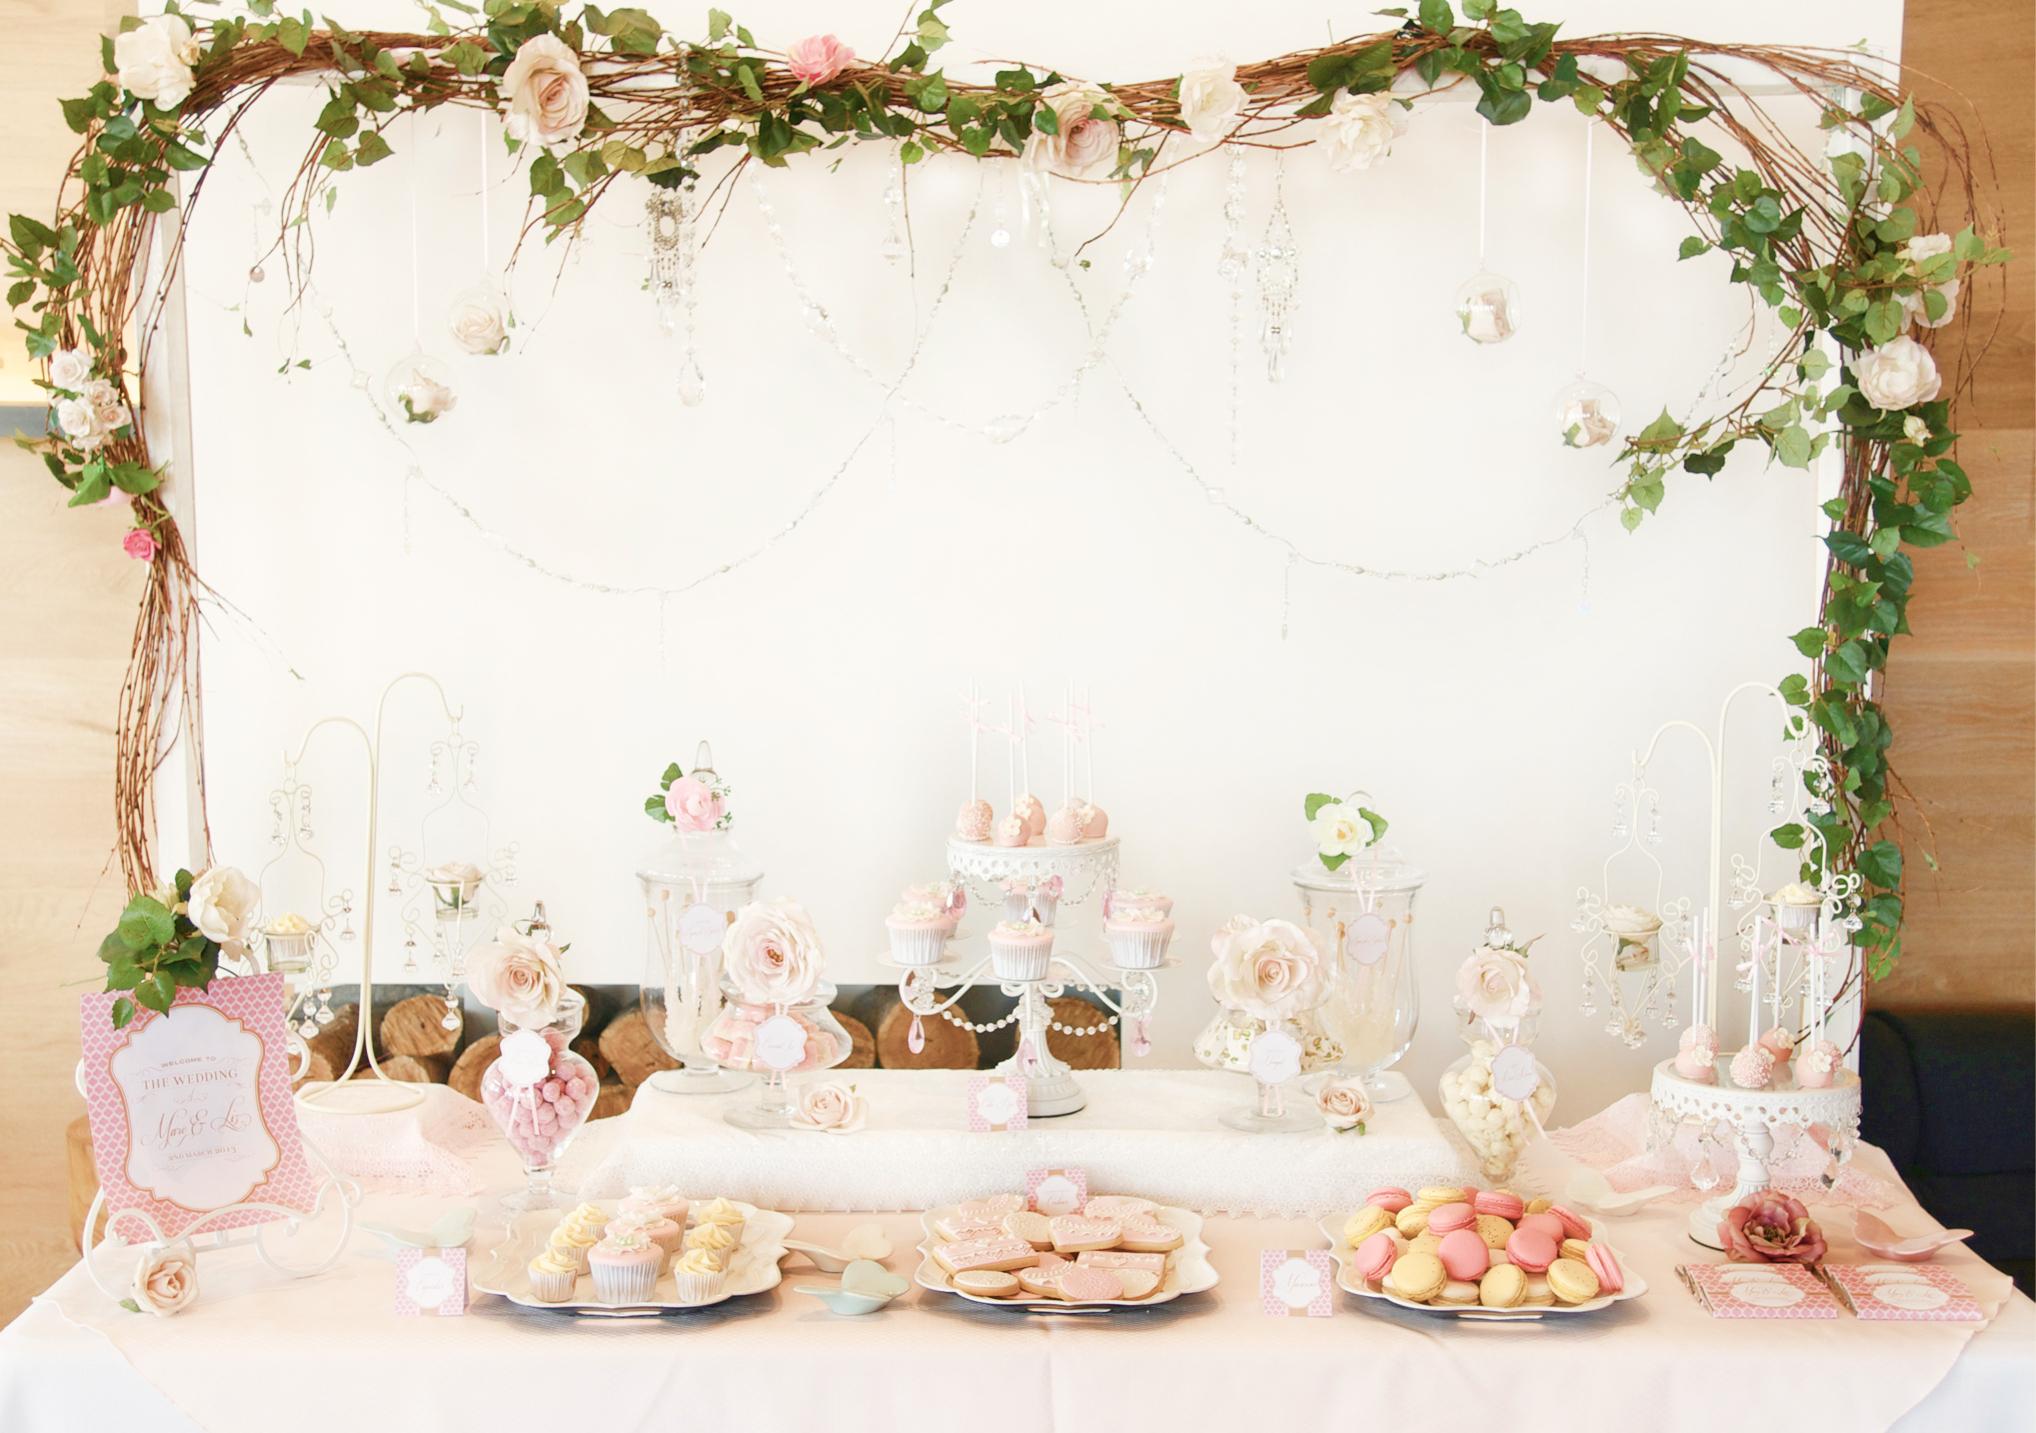 Fresh Dessert Table Inspiration | SouthBound Bride